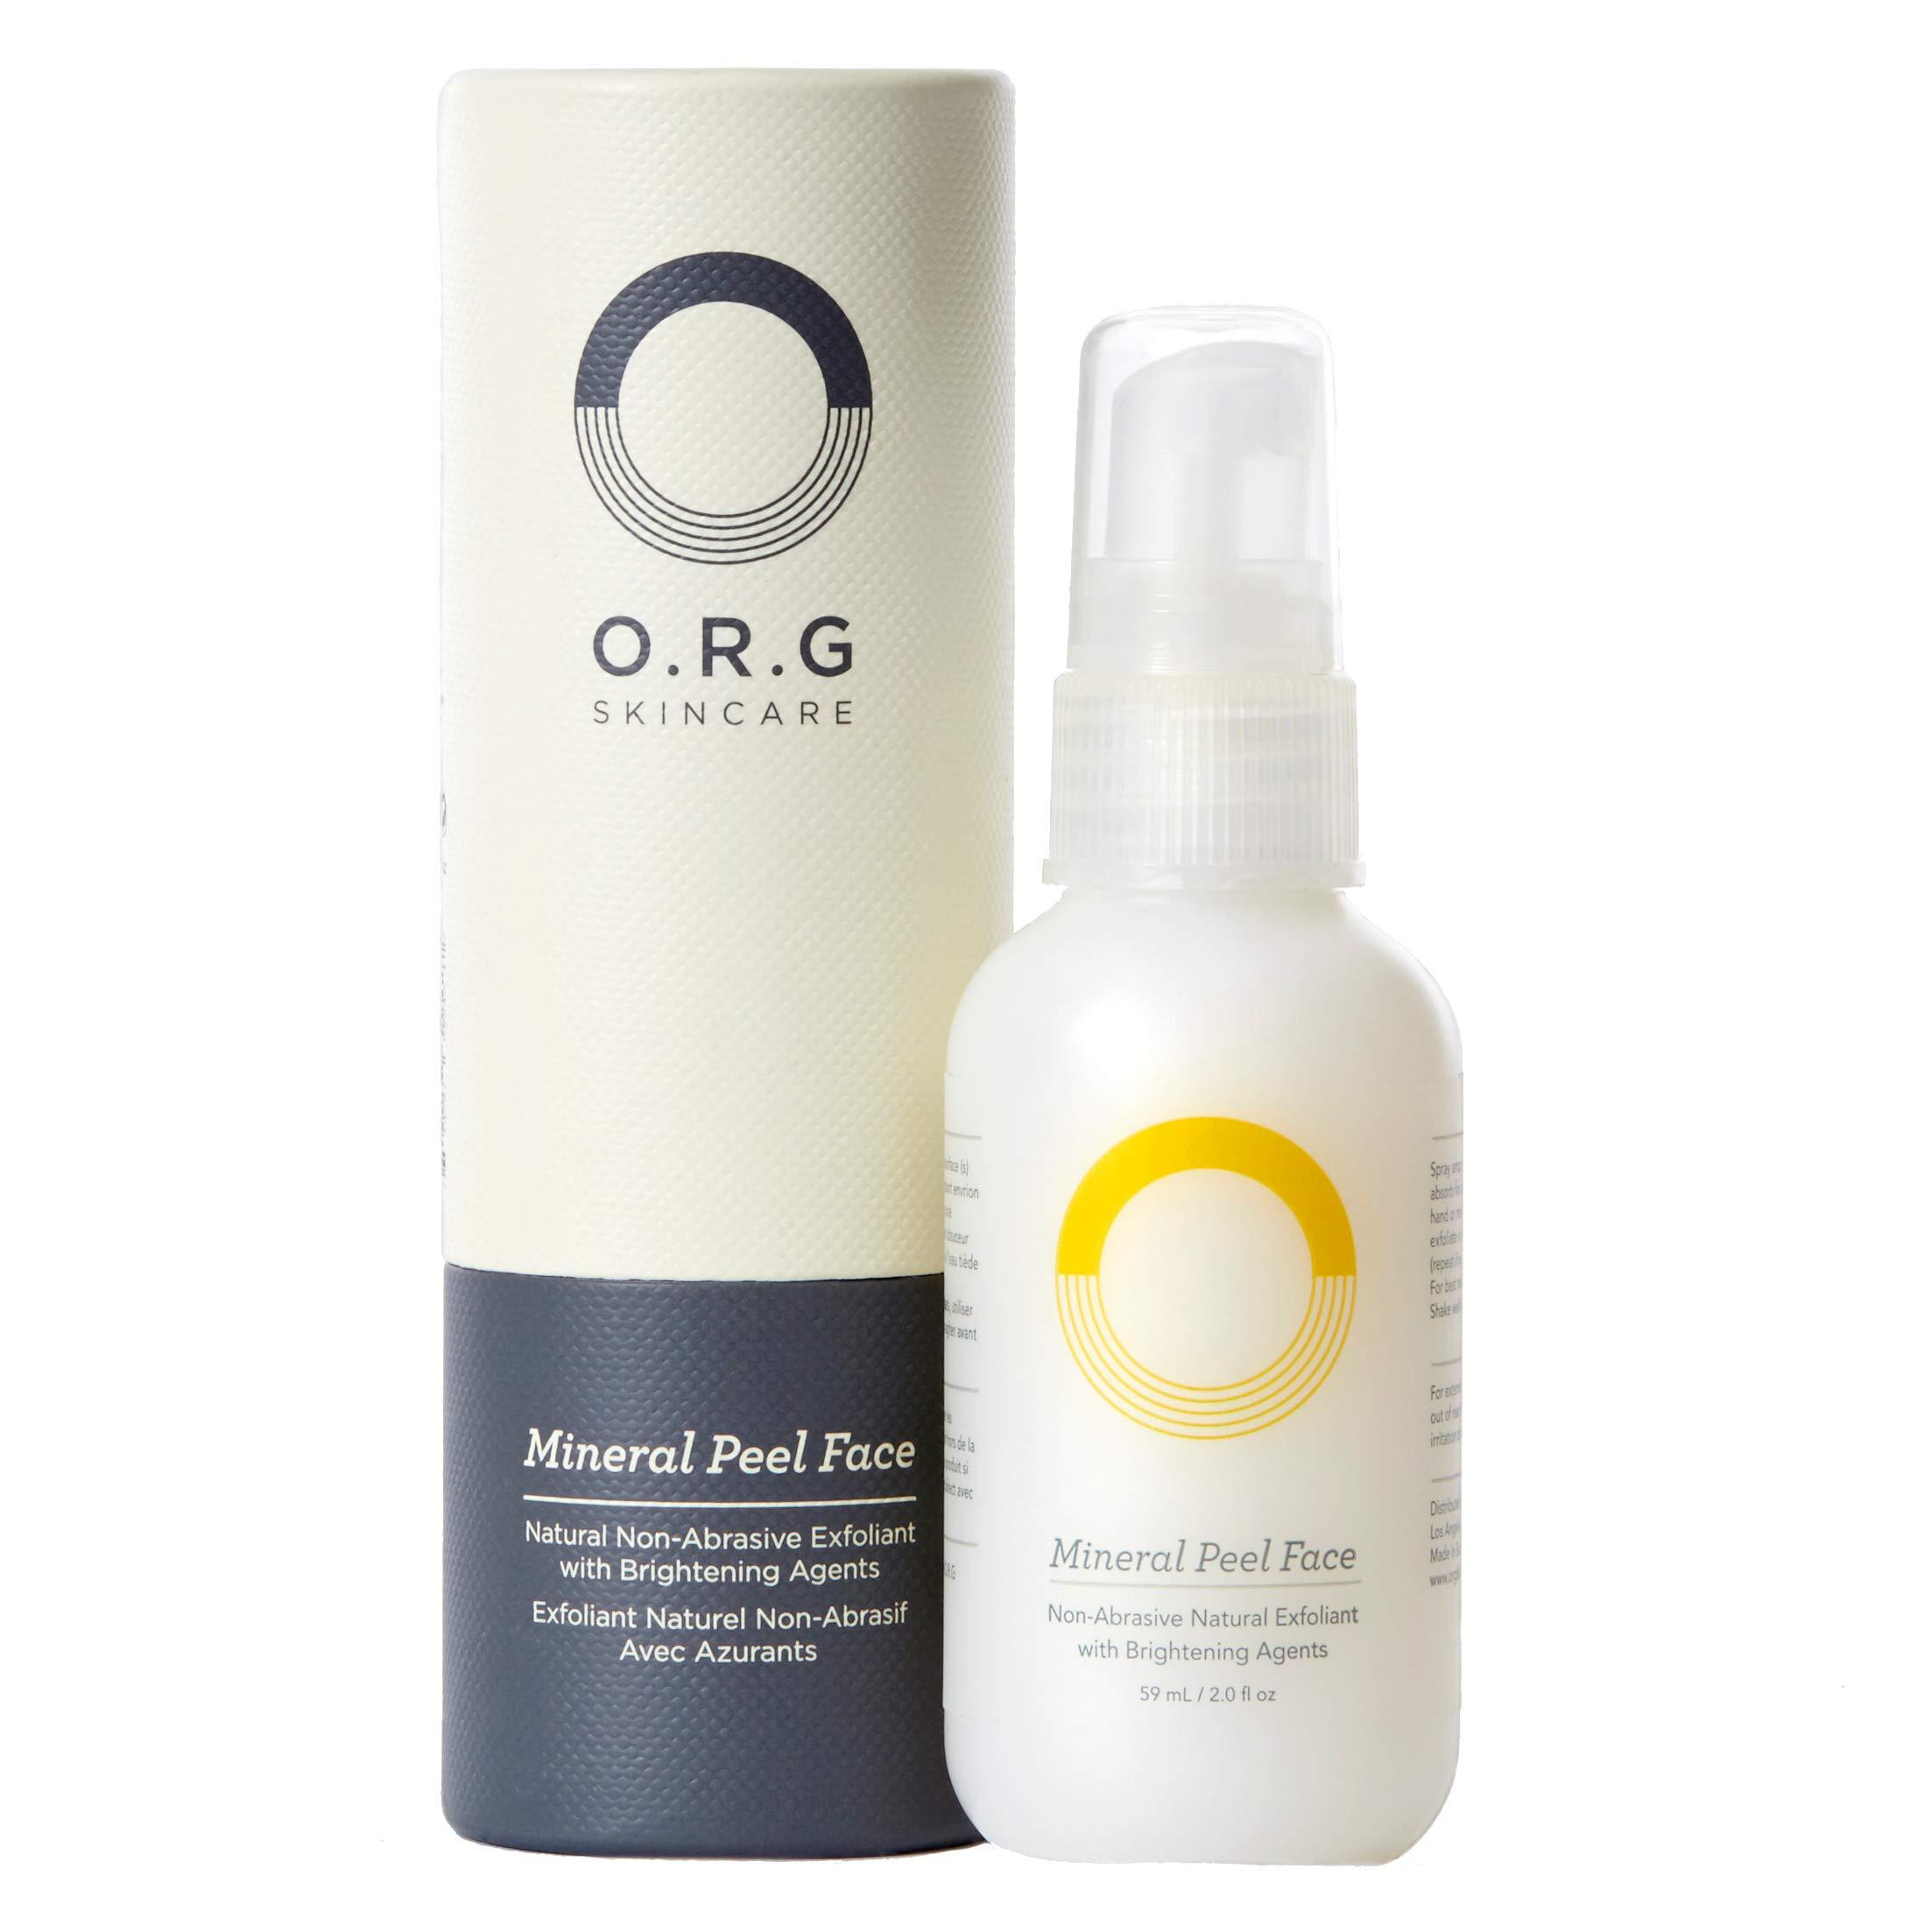 O.R.G. Skincare Mineral Peel Face, 2 oz by O.R.G. Skincare